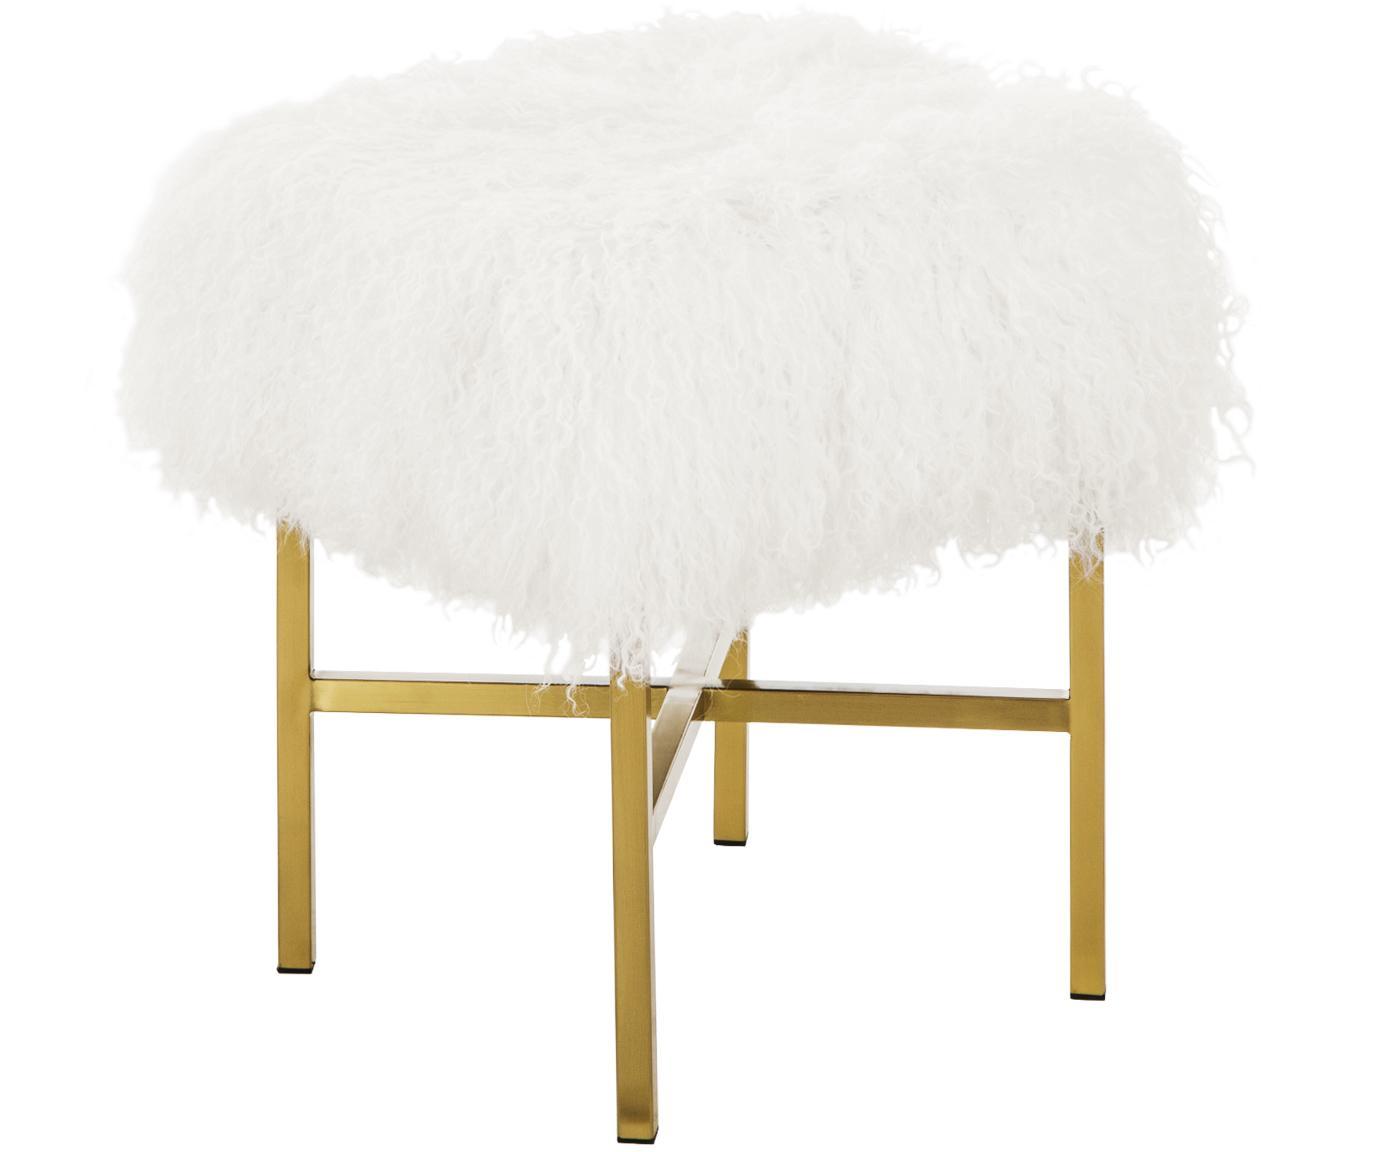 Kruk Arlo, Bekleding: Mongoolse schapenvacht, Frame: gecoat metaal, Bekleding: crèmekleurig. Poten: glanzend geborsteld goudkleurig, 35 x 45 cm